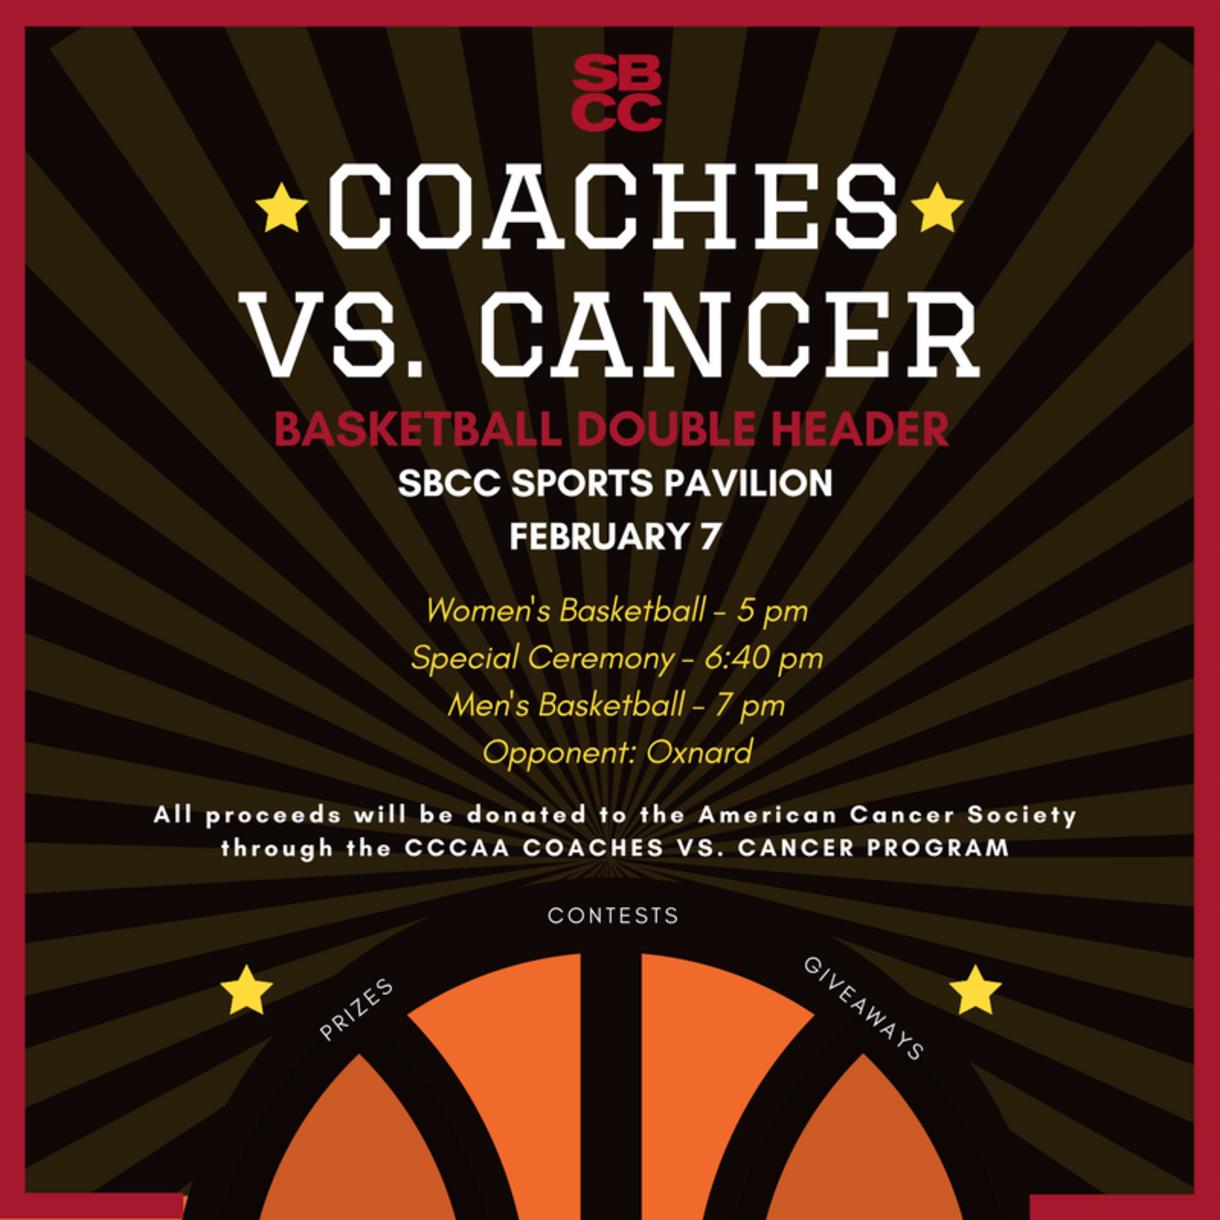 Feb. 7 — SBCC presents: Coaches vs. Cancer Basketball Fundraiser